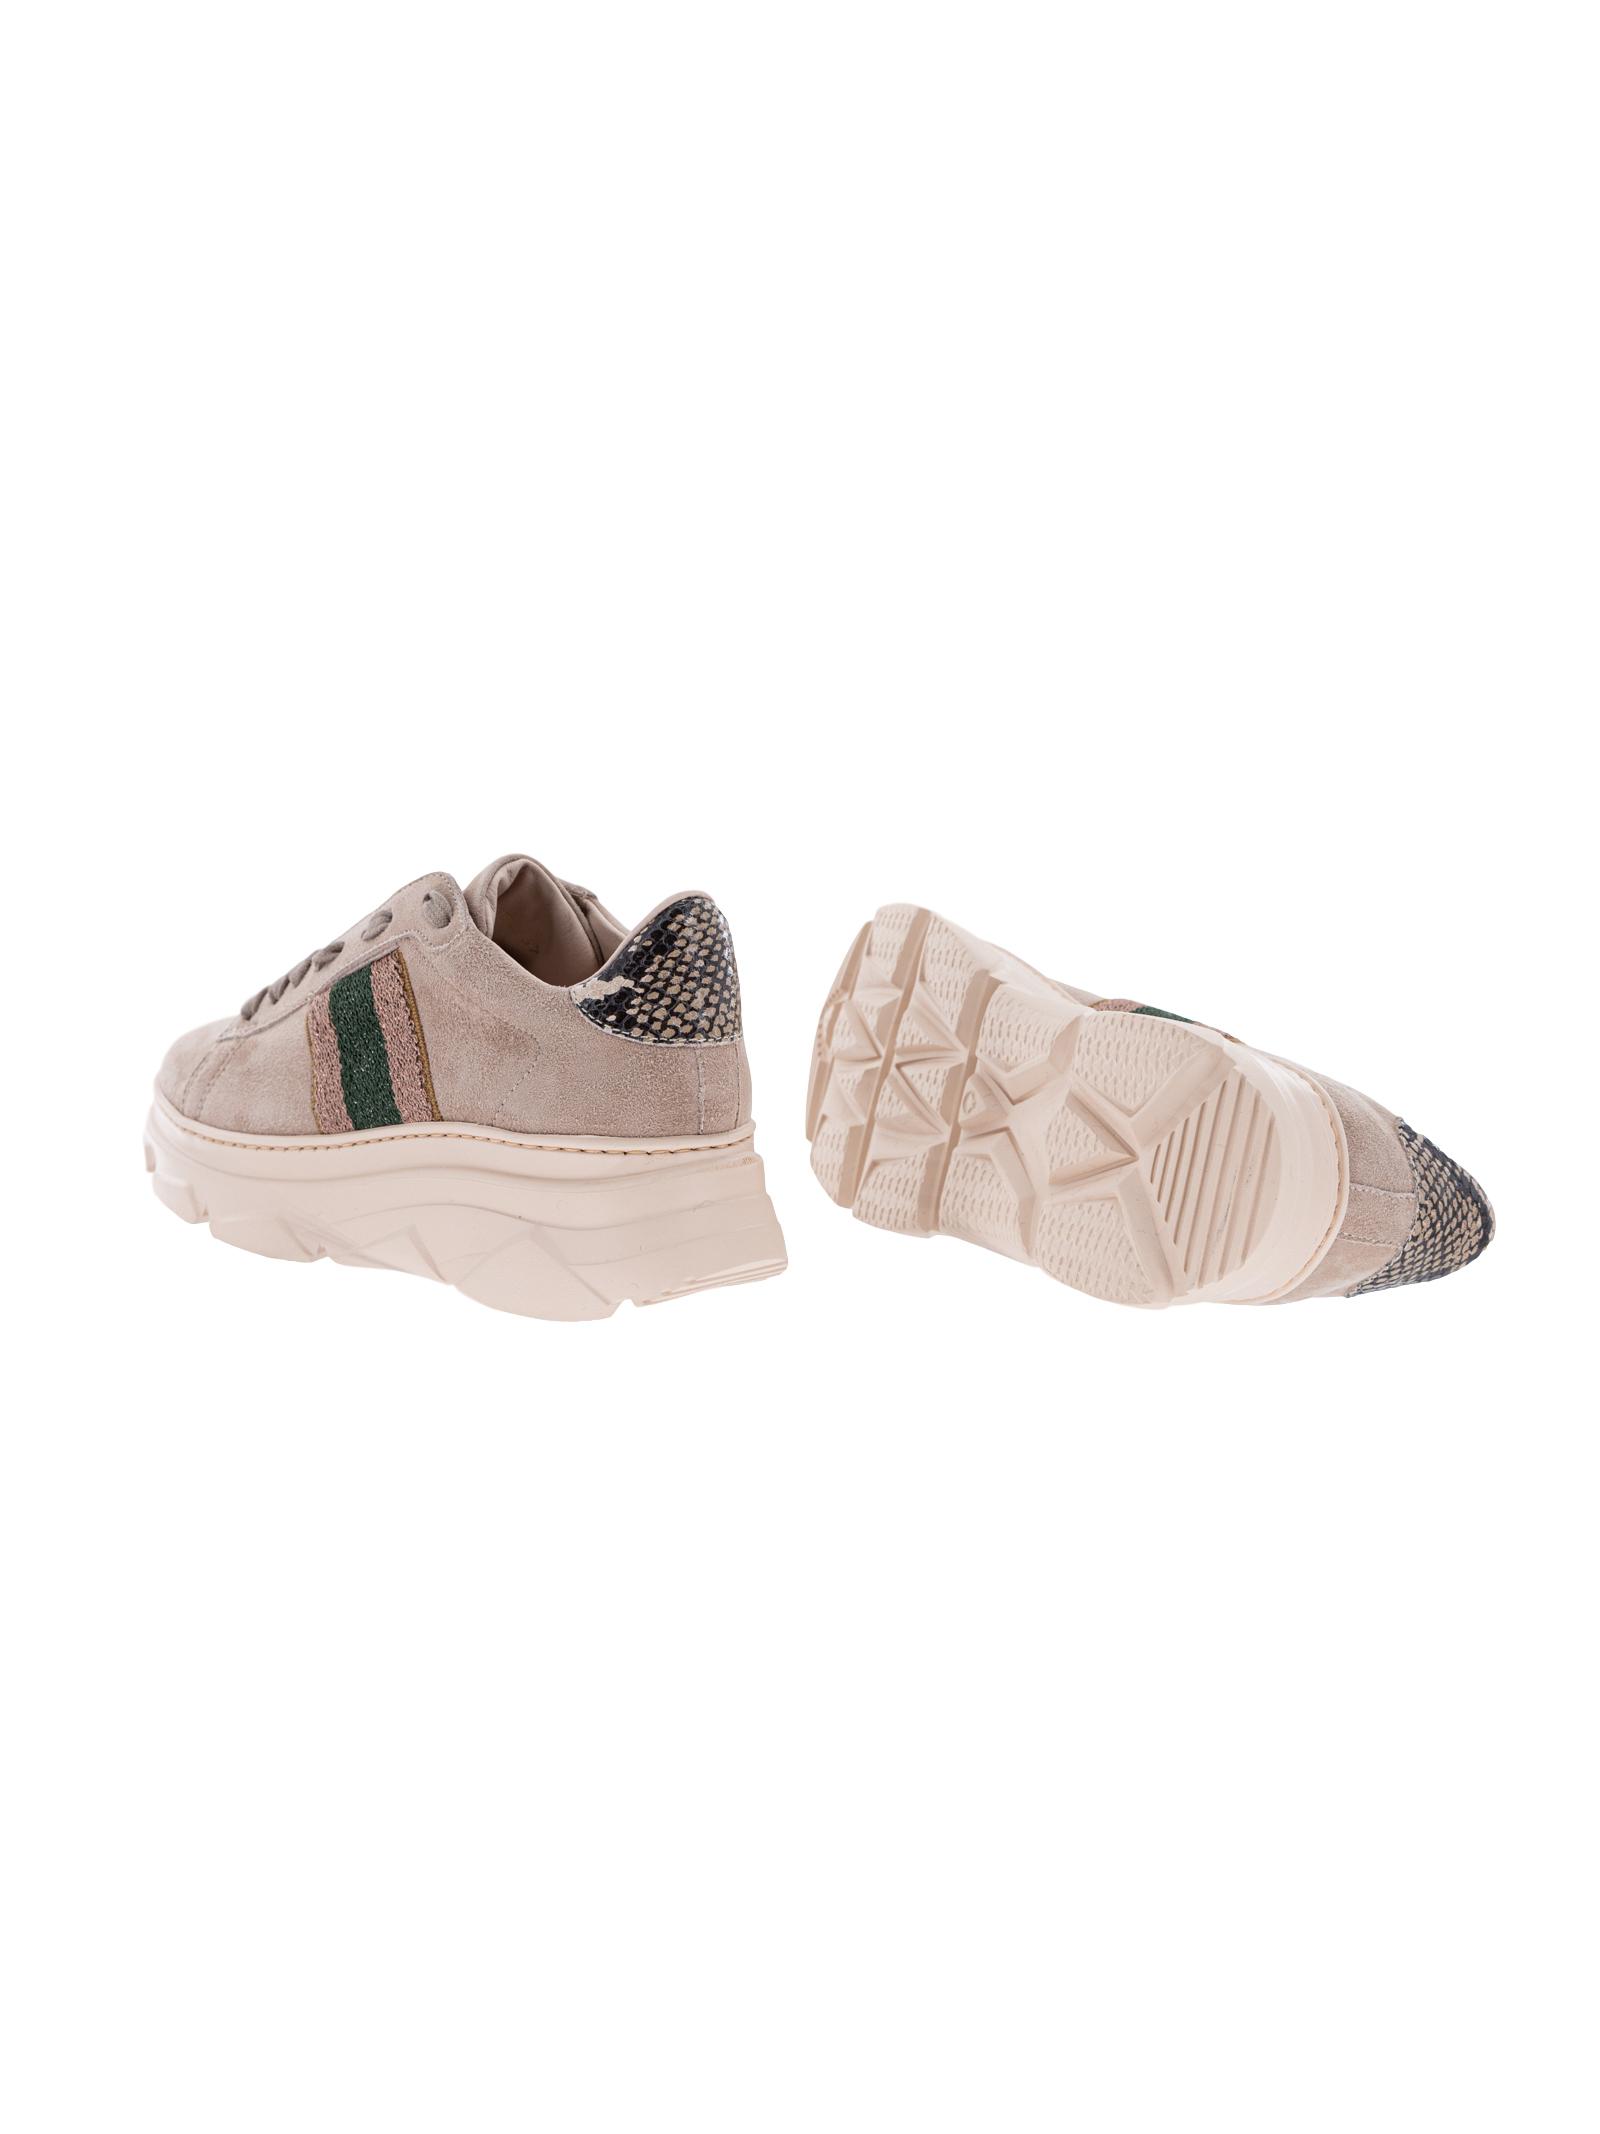 Sneakers STOKTON 650-D-FW20-U Cipro nude+elastico spug